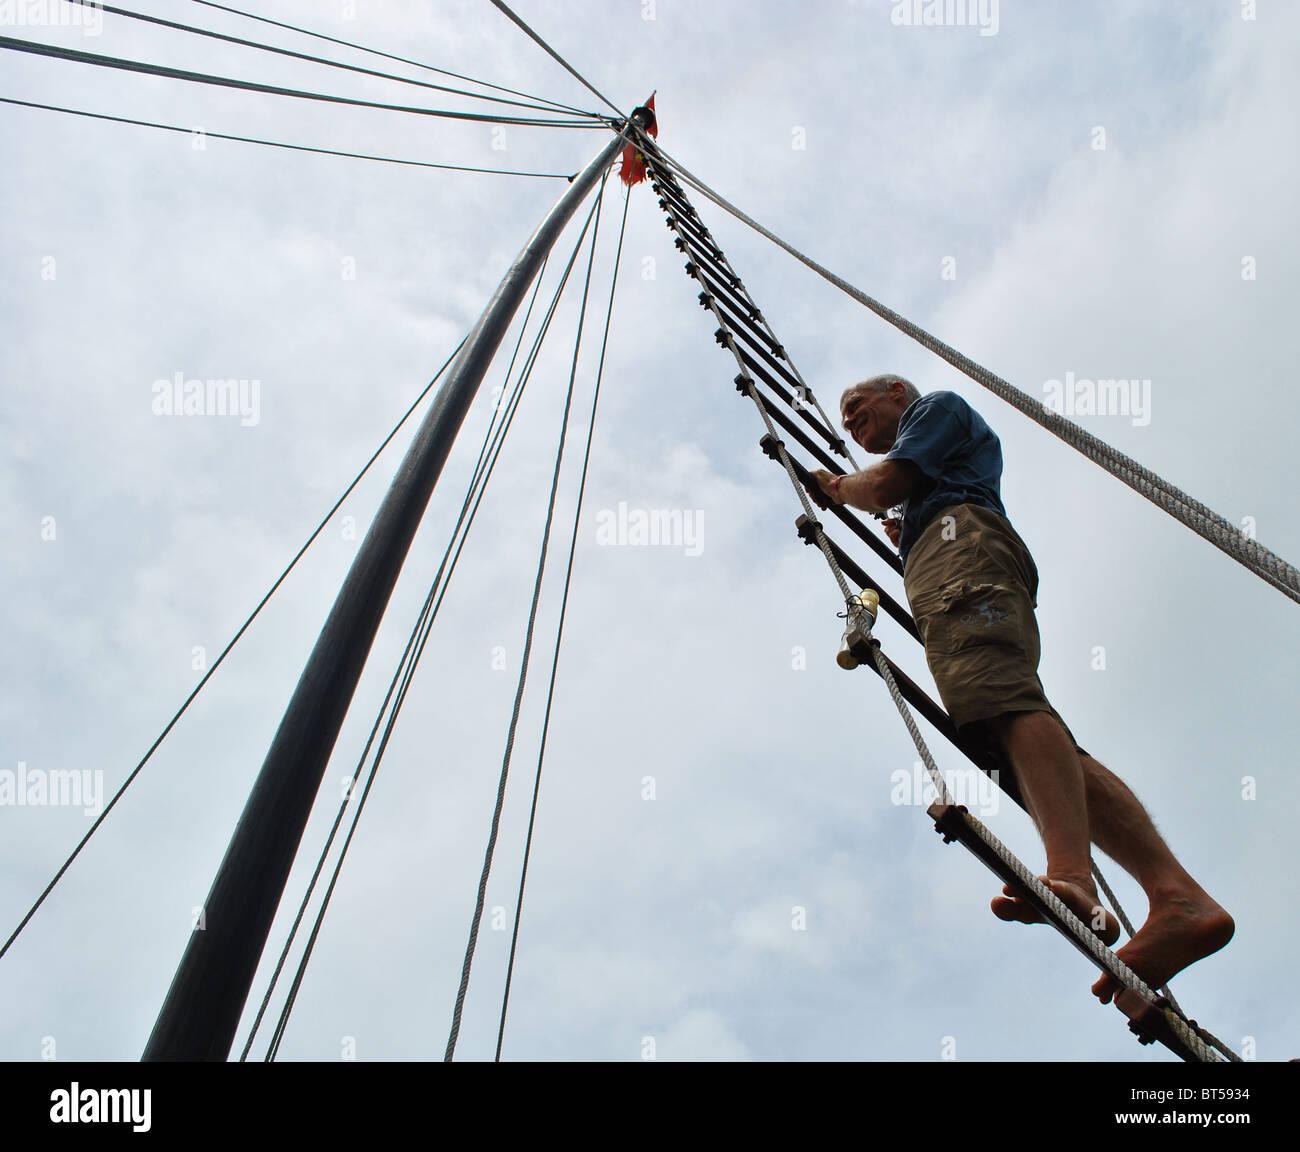 Man climbing rigging of Junk, Vietnam - Stock Image